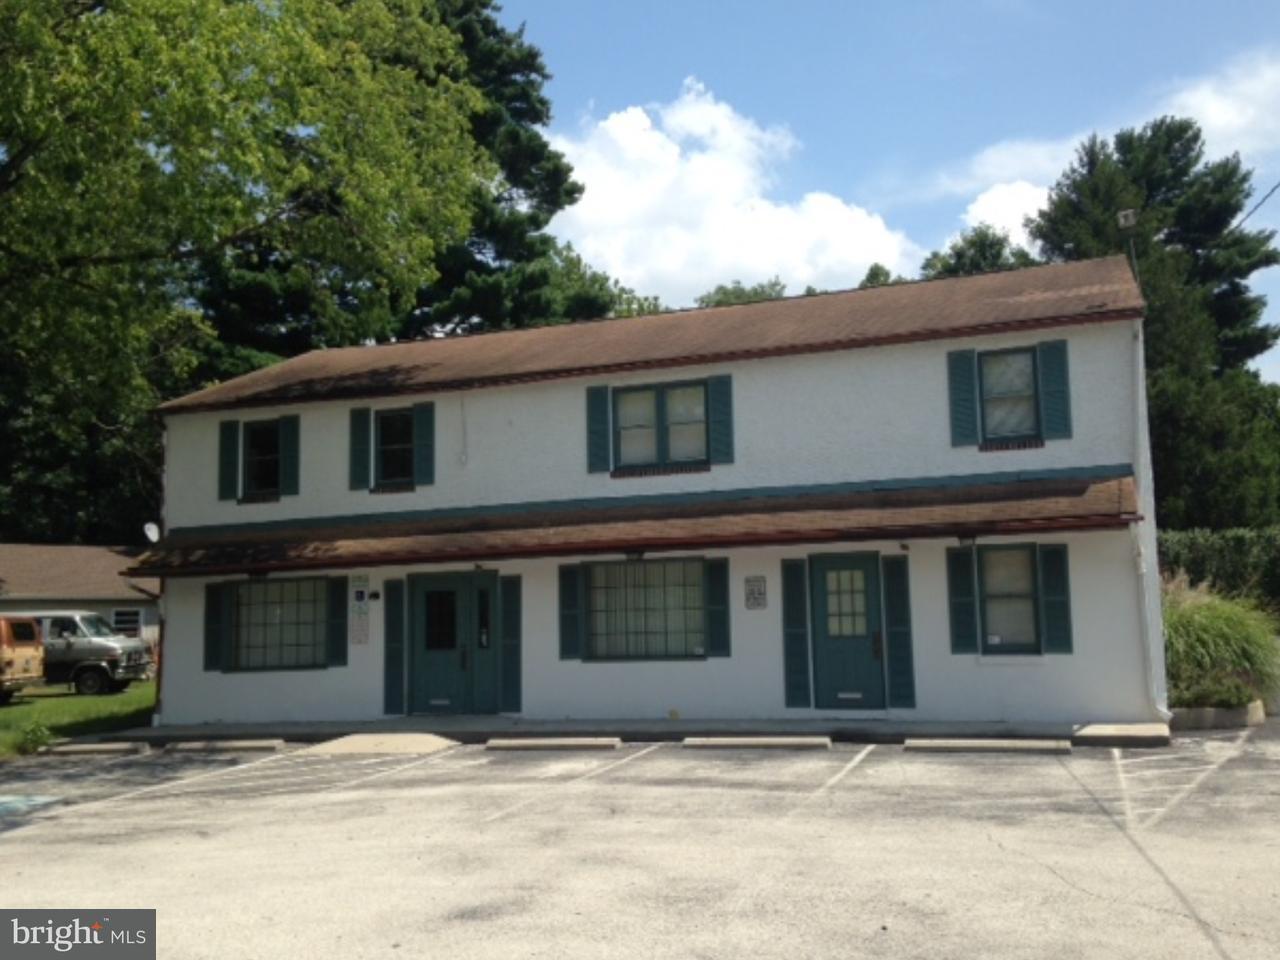 Single Family Home for Sale at 1032 S PARK Avenue Audubon, Pennsylvania 19403 United States